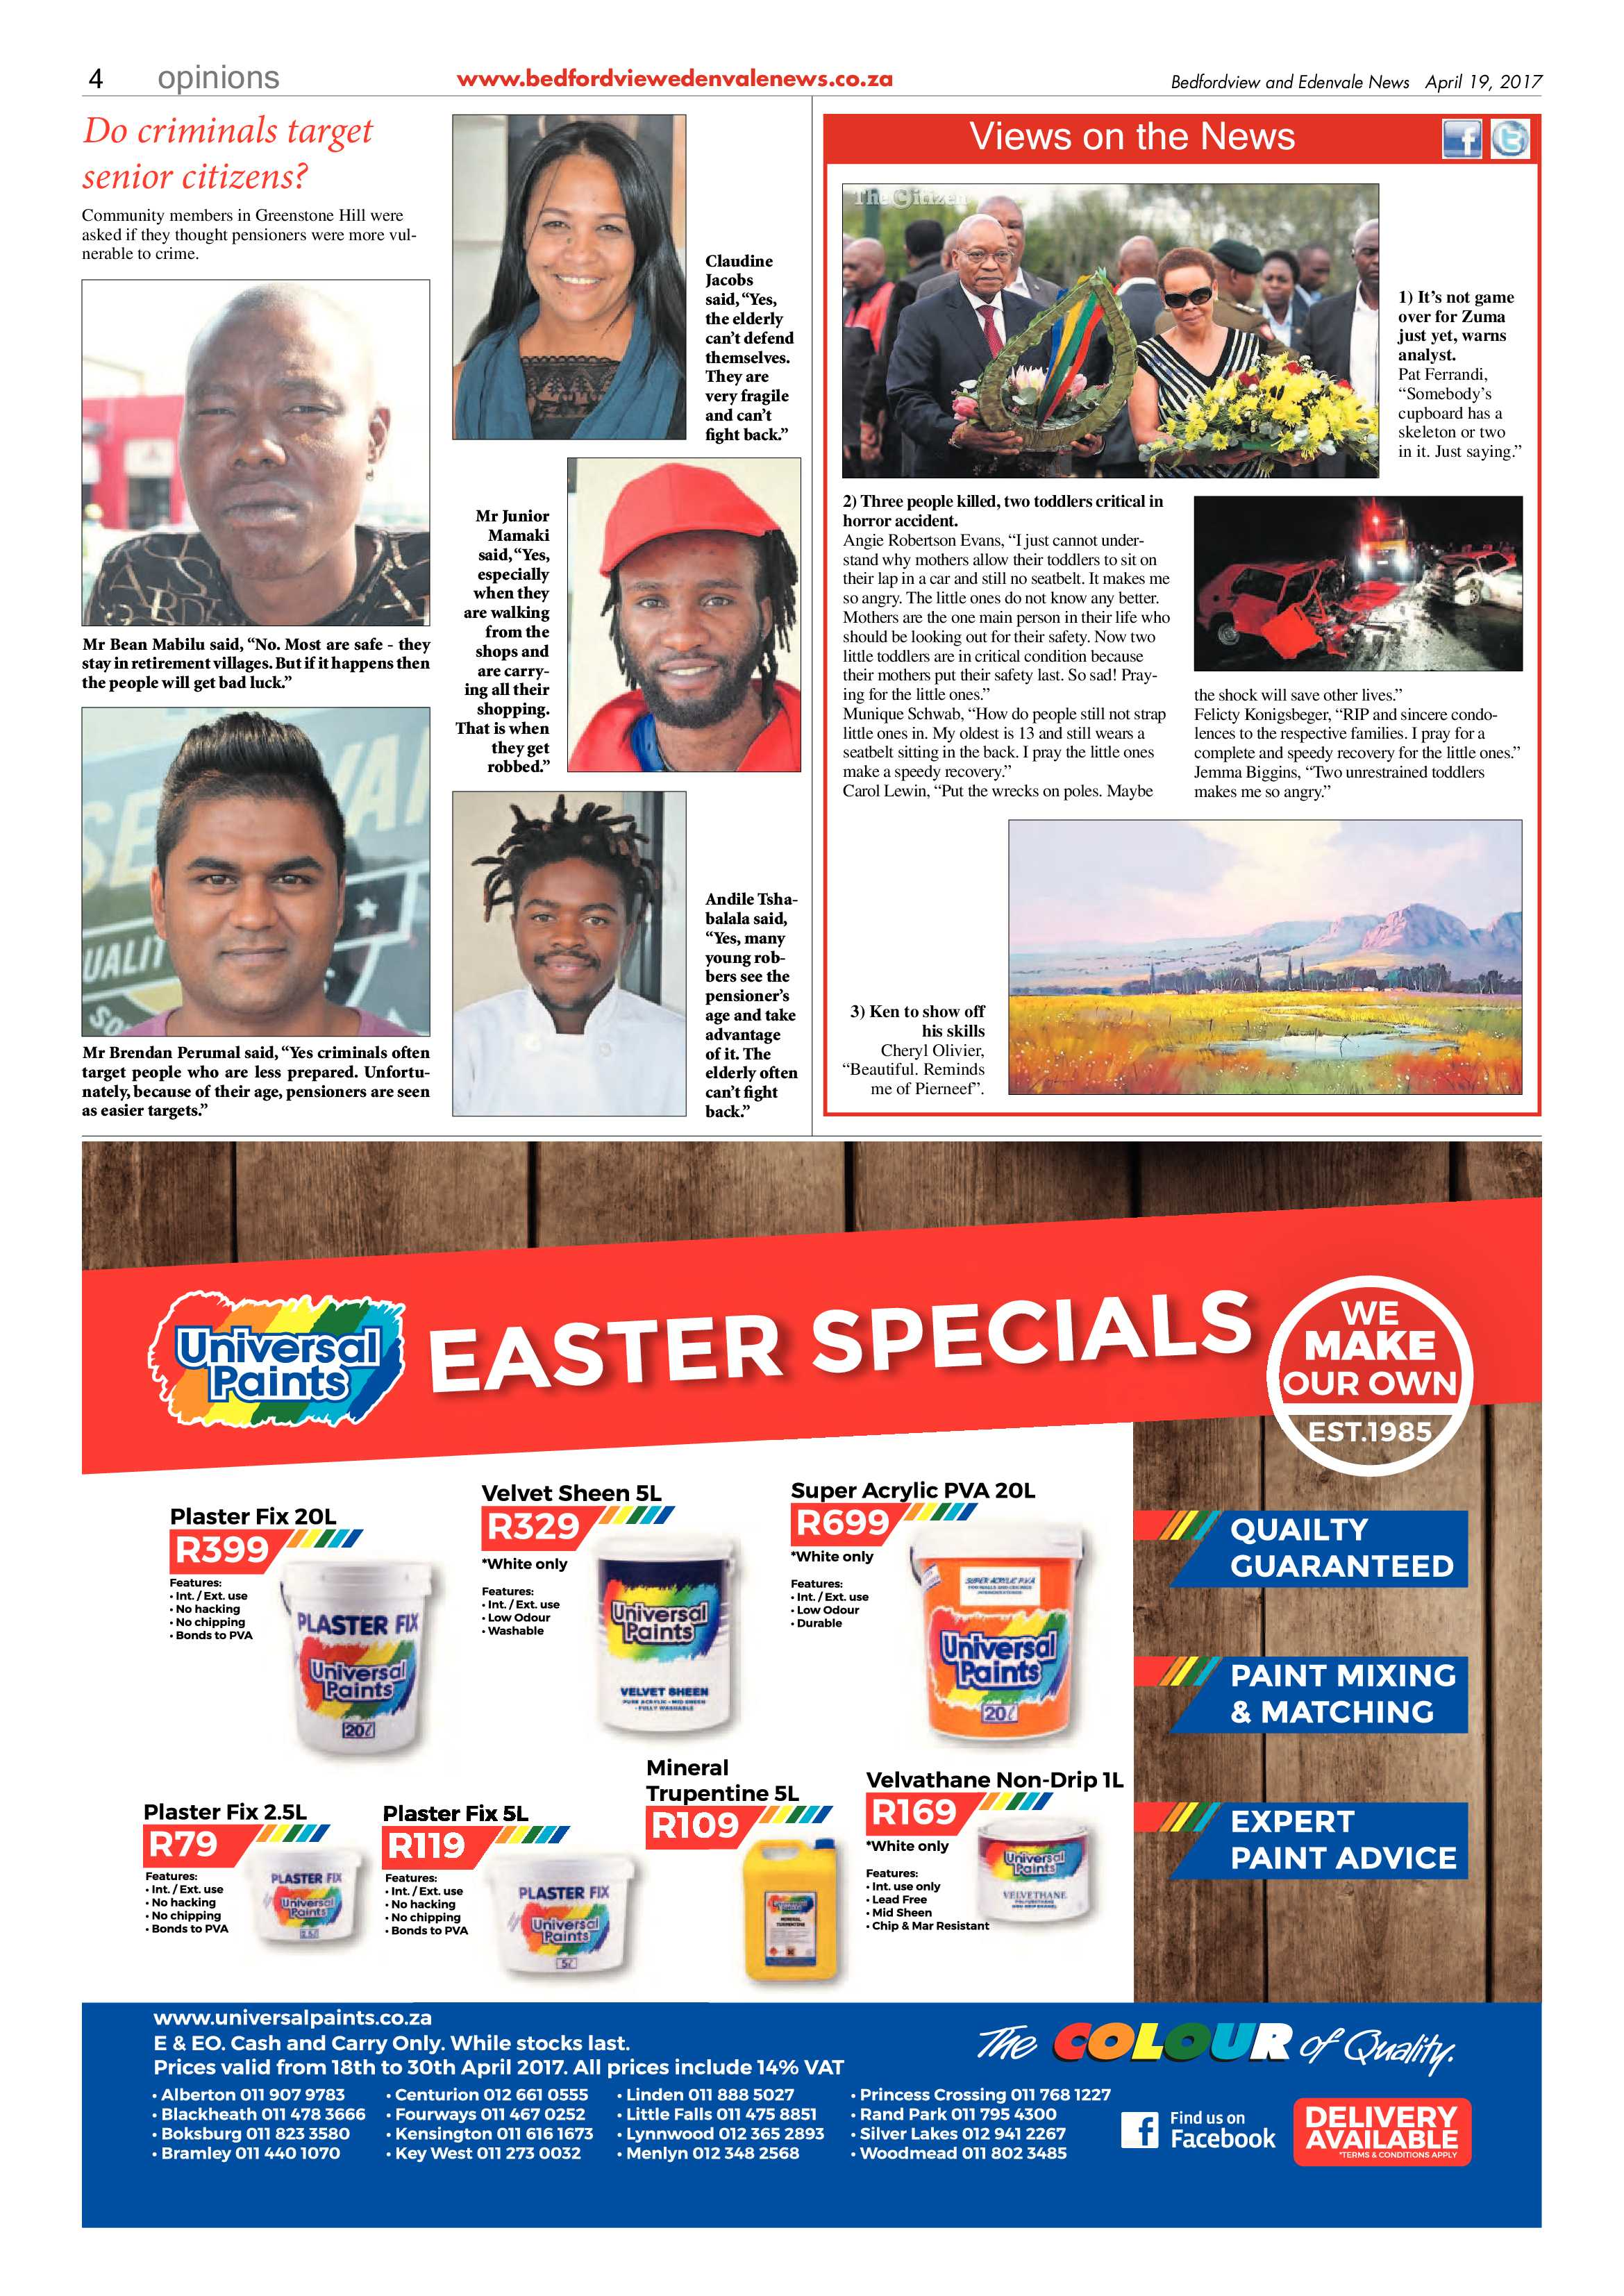 bedfordview-edenvale-news-19-april-2017-epapers-page-4